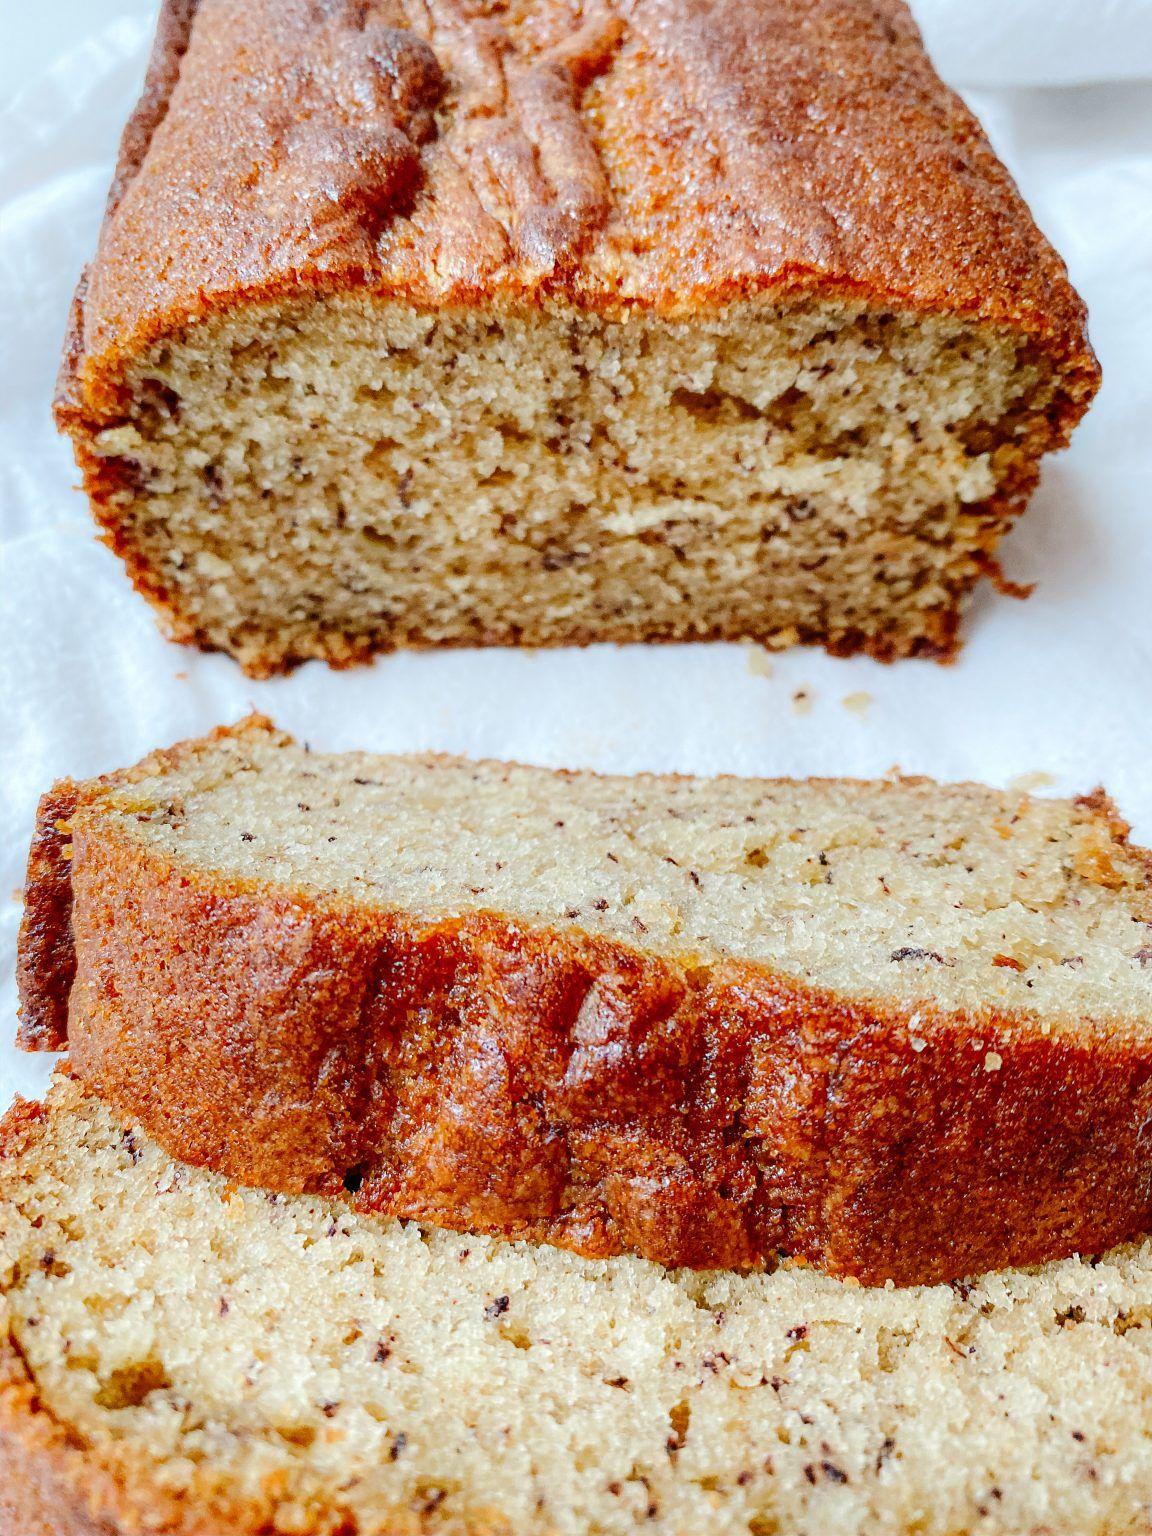 Double Batch Banana Bread Plum Street Collective Recipe In 2020 Banana Bread Bread Baking Sweet